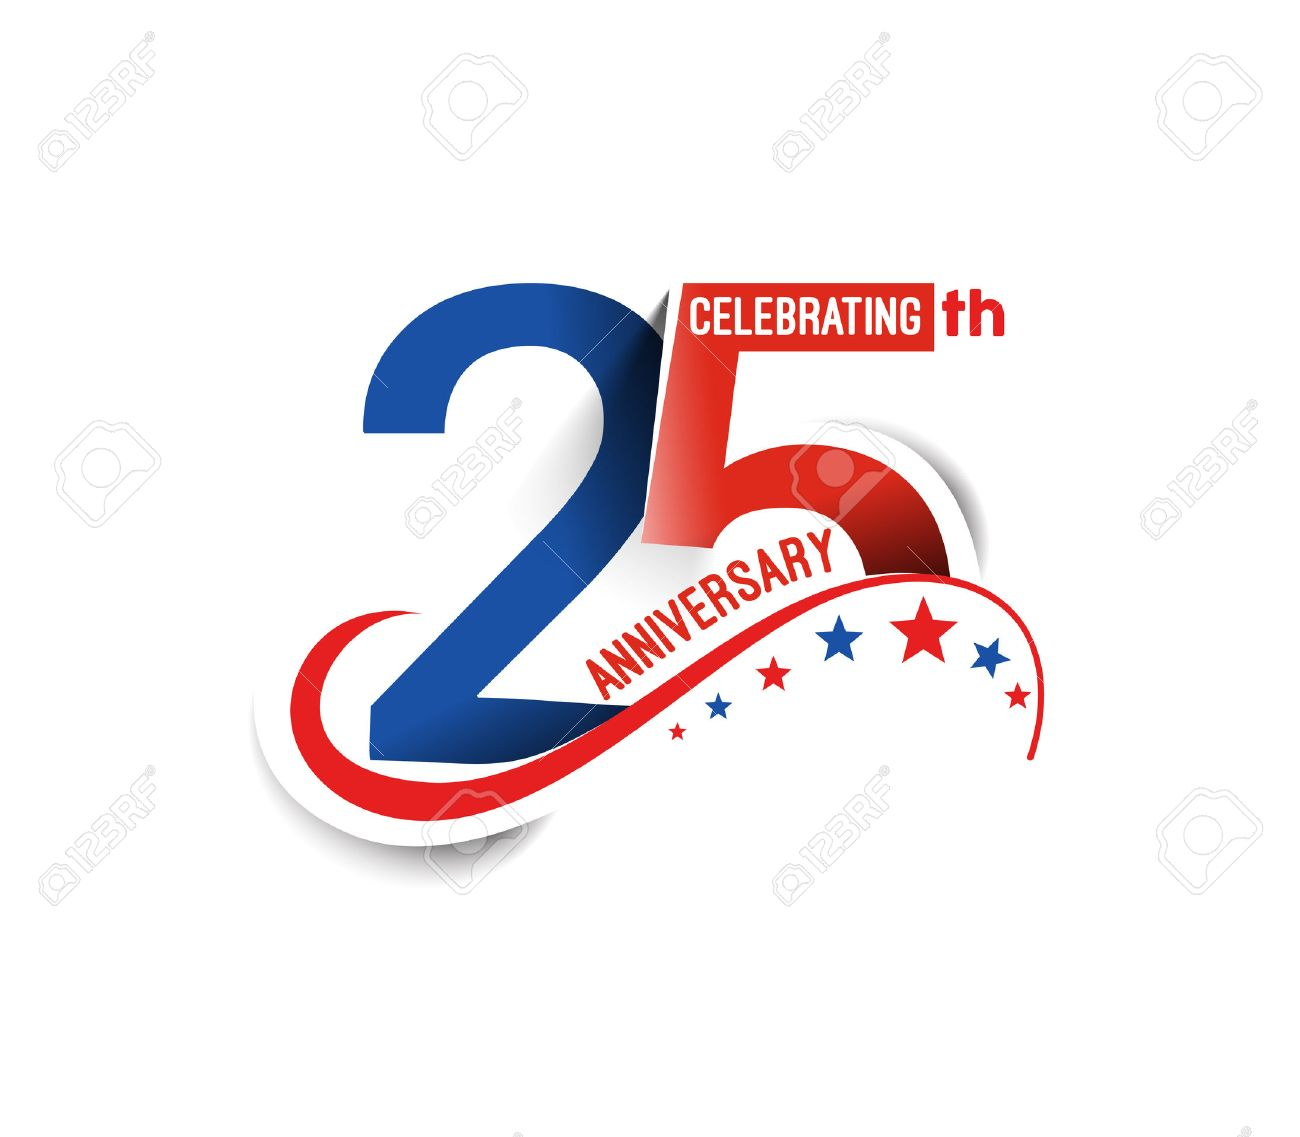 25th Years Anniversary Celebration Design. - 51909861